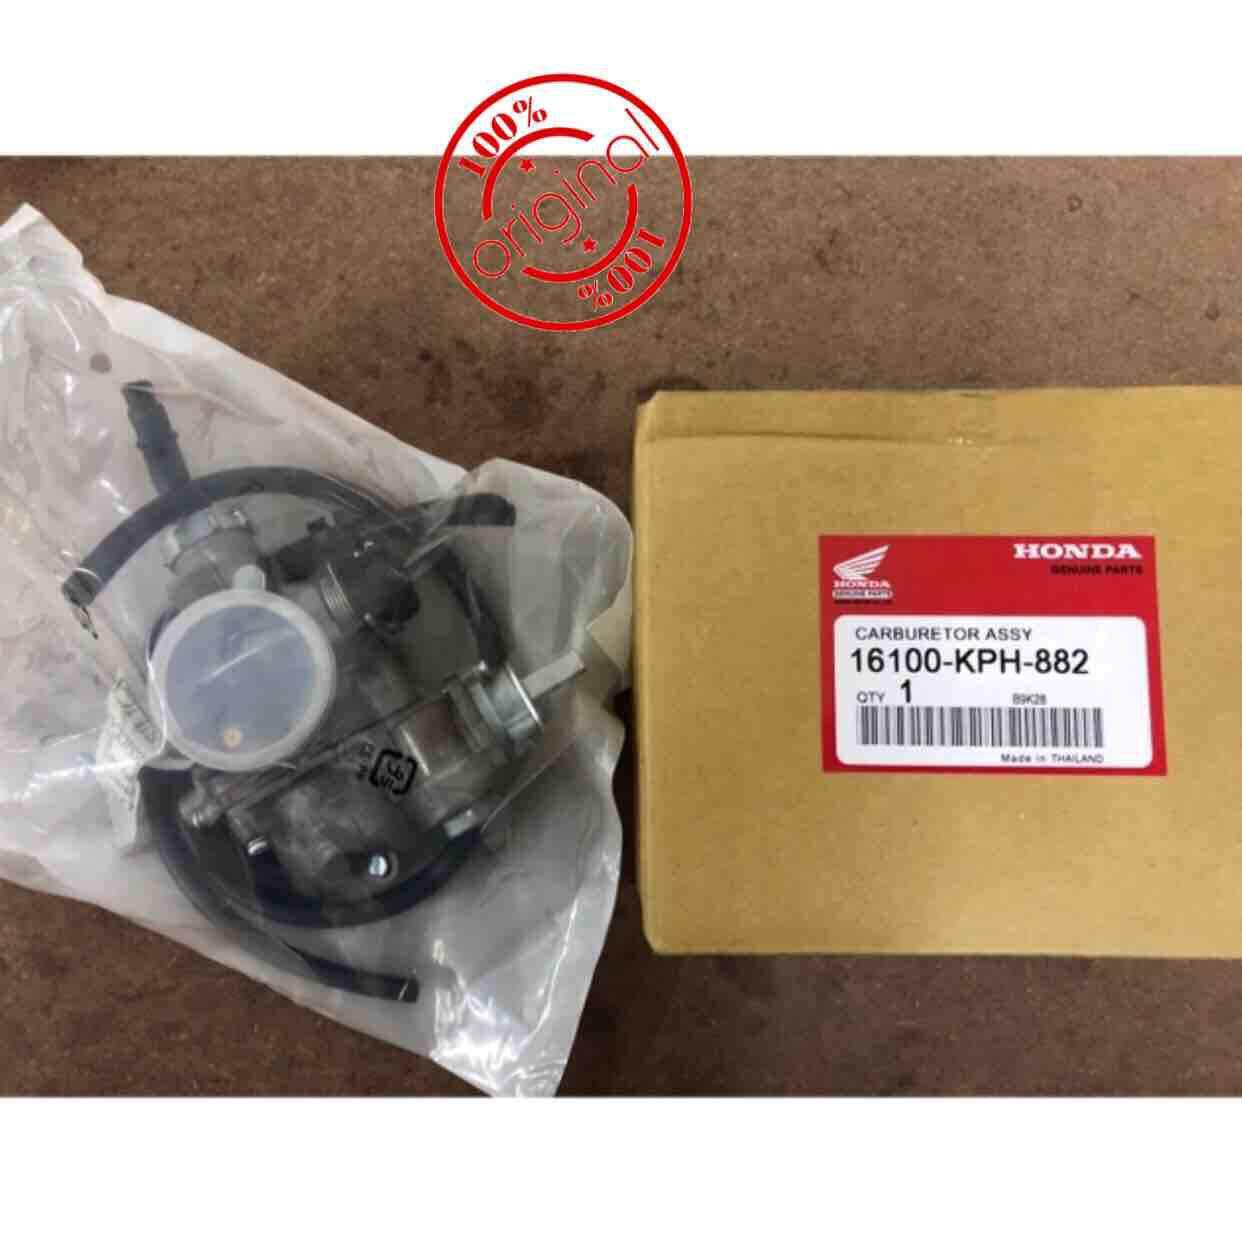 Honda Auto Parts Spares Price In Malaysia Best Online Store 1999 Crv Camshaft Timing Belt Carburetor Wave 125 100 Original